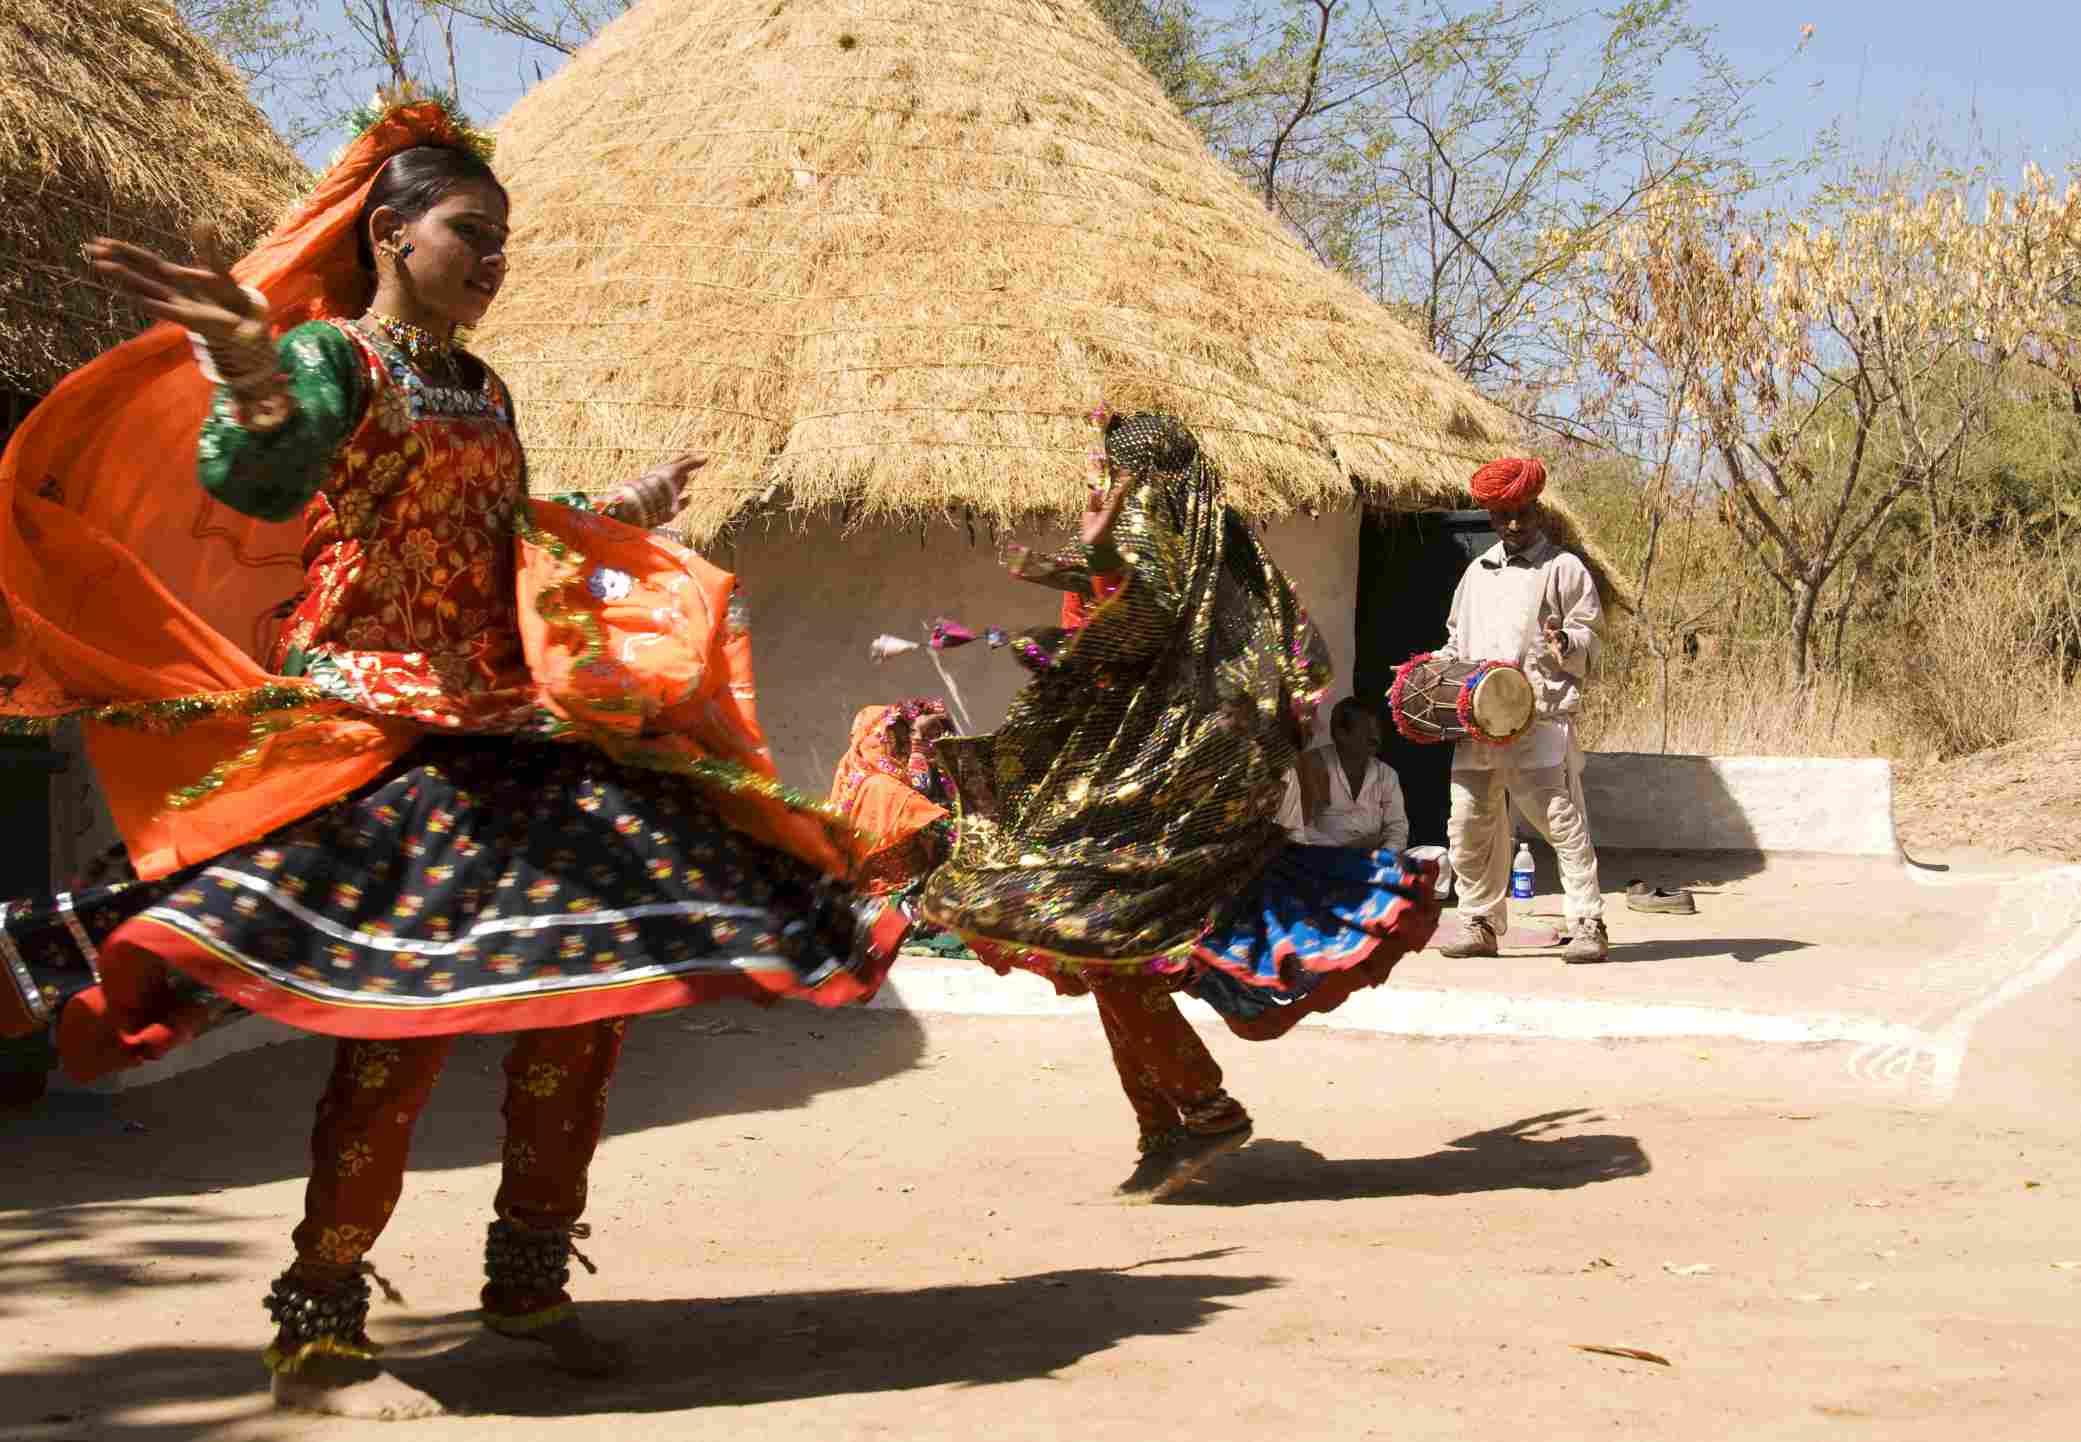 Two Indian women dancing in traditional dress